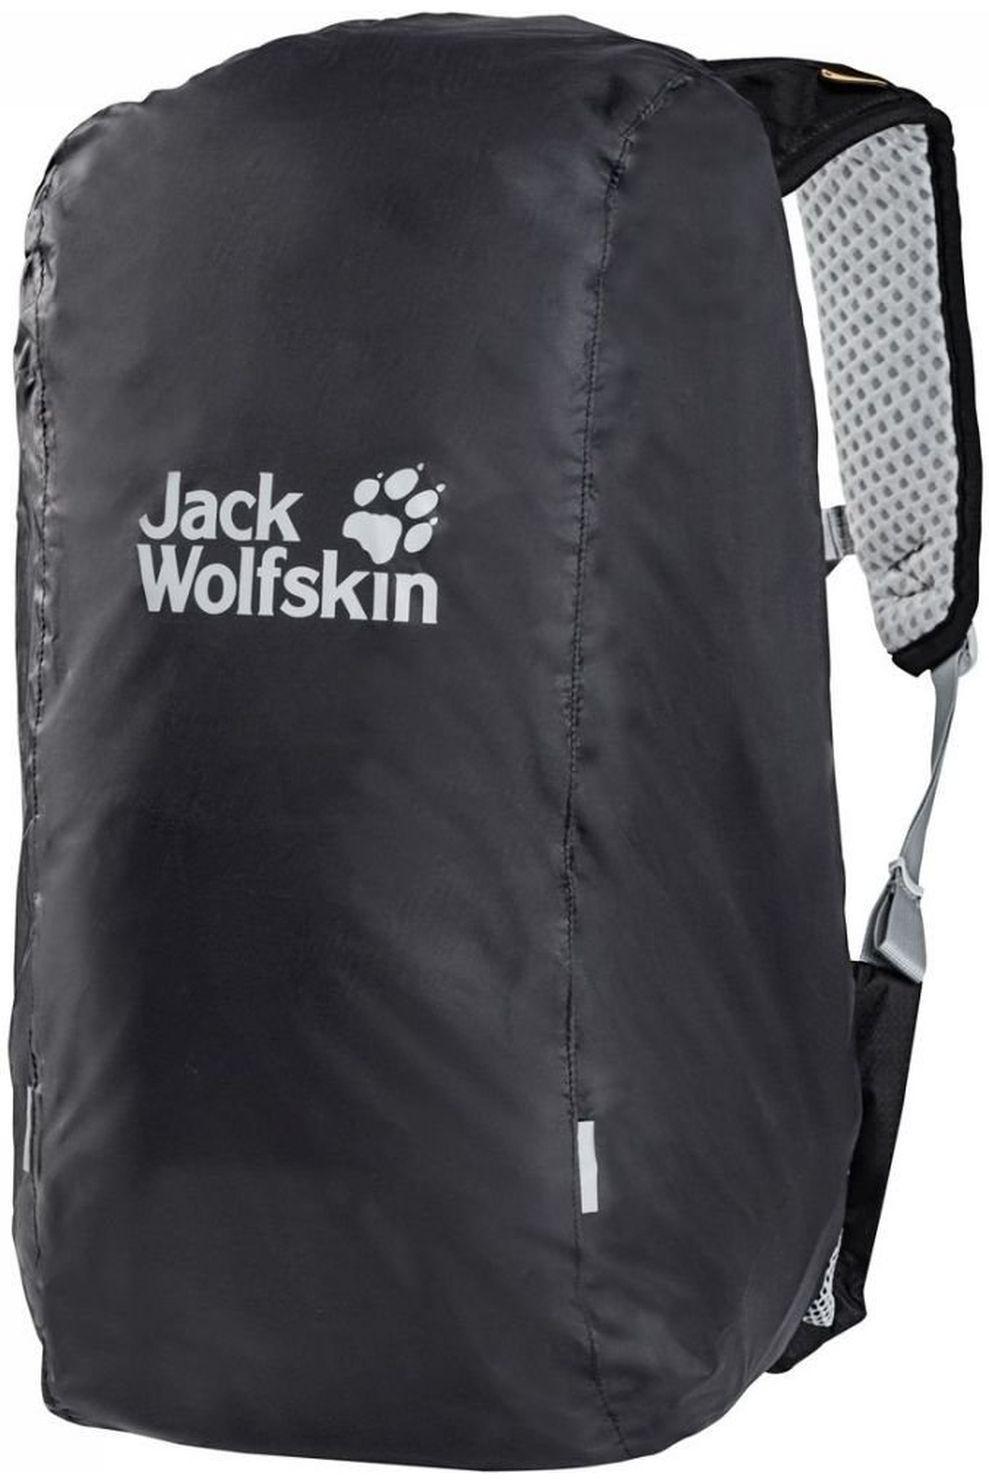 Jack Wolfskin Regenhoes Raincover 30-40L - Grijs